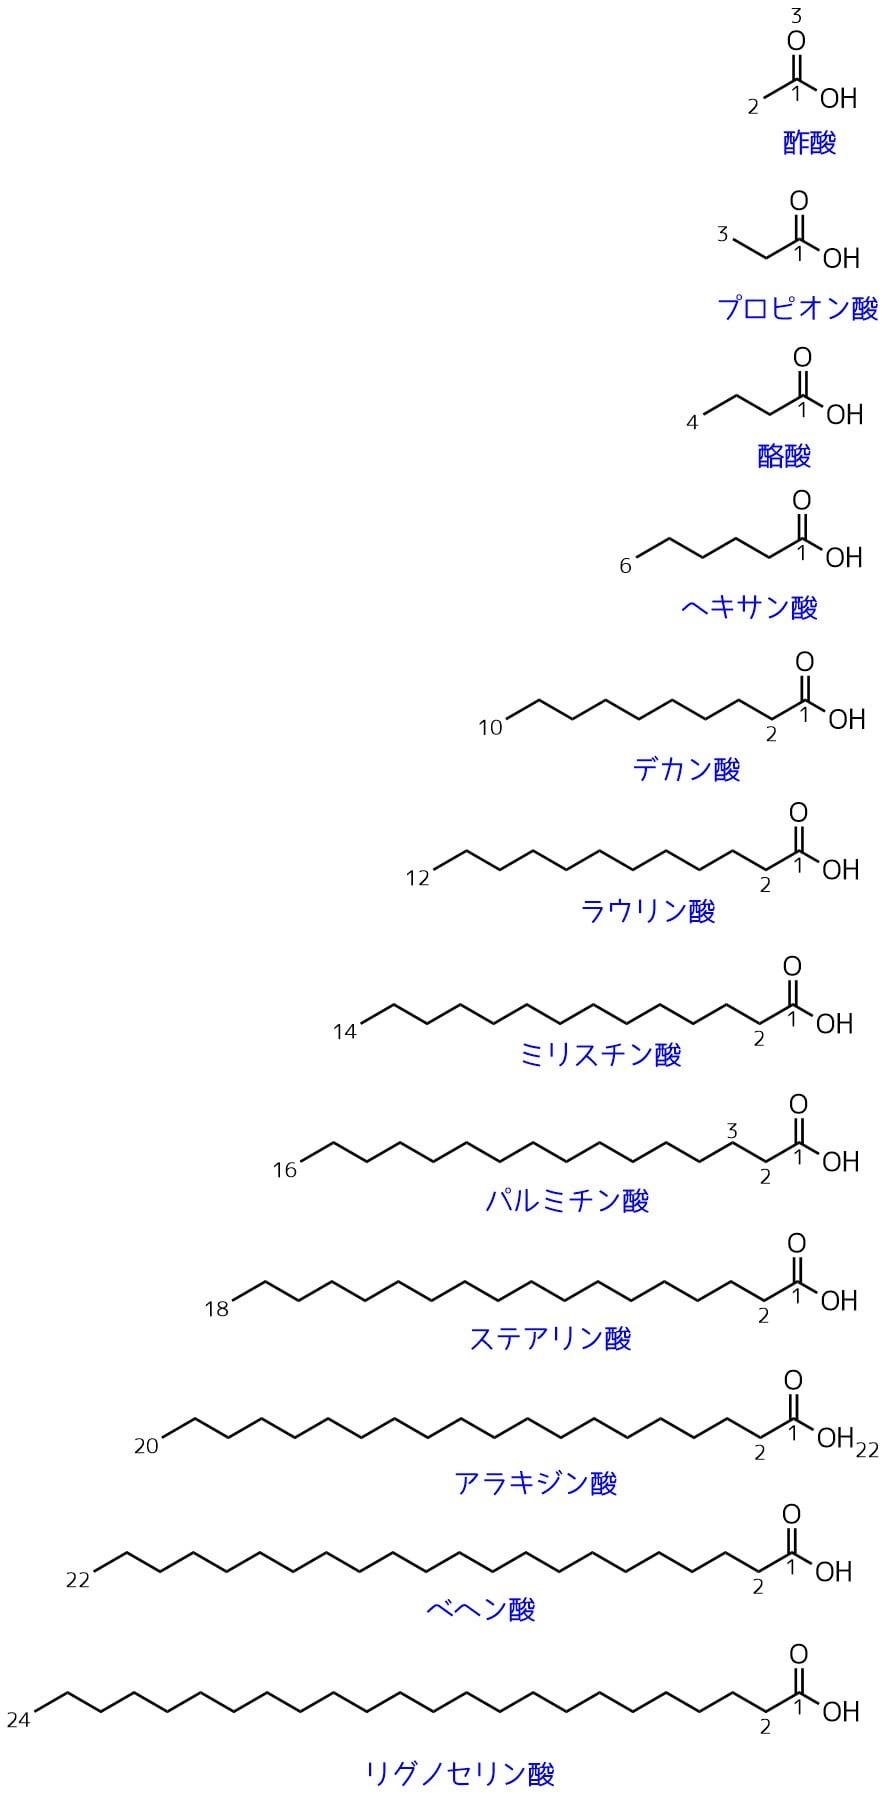 単純脂肪酸の構造